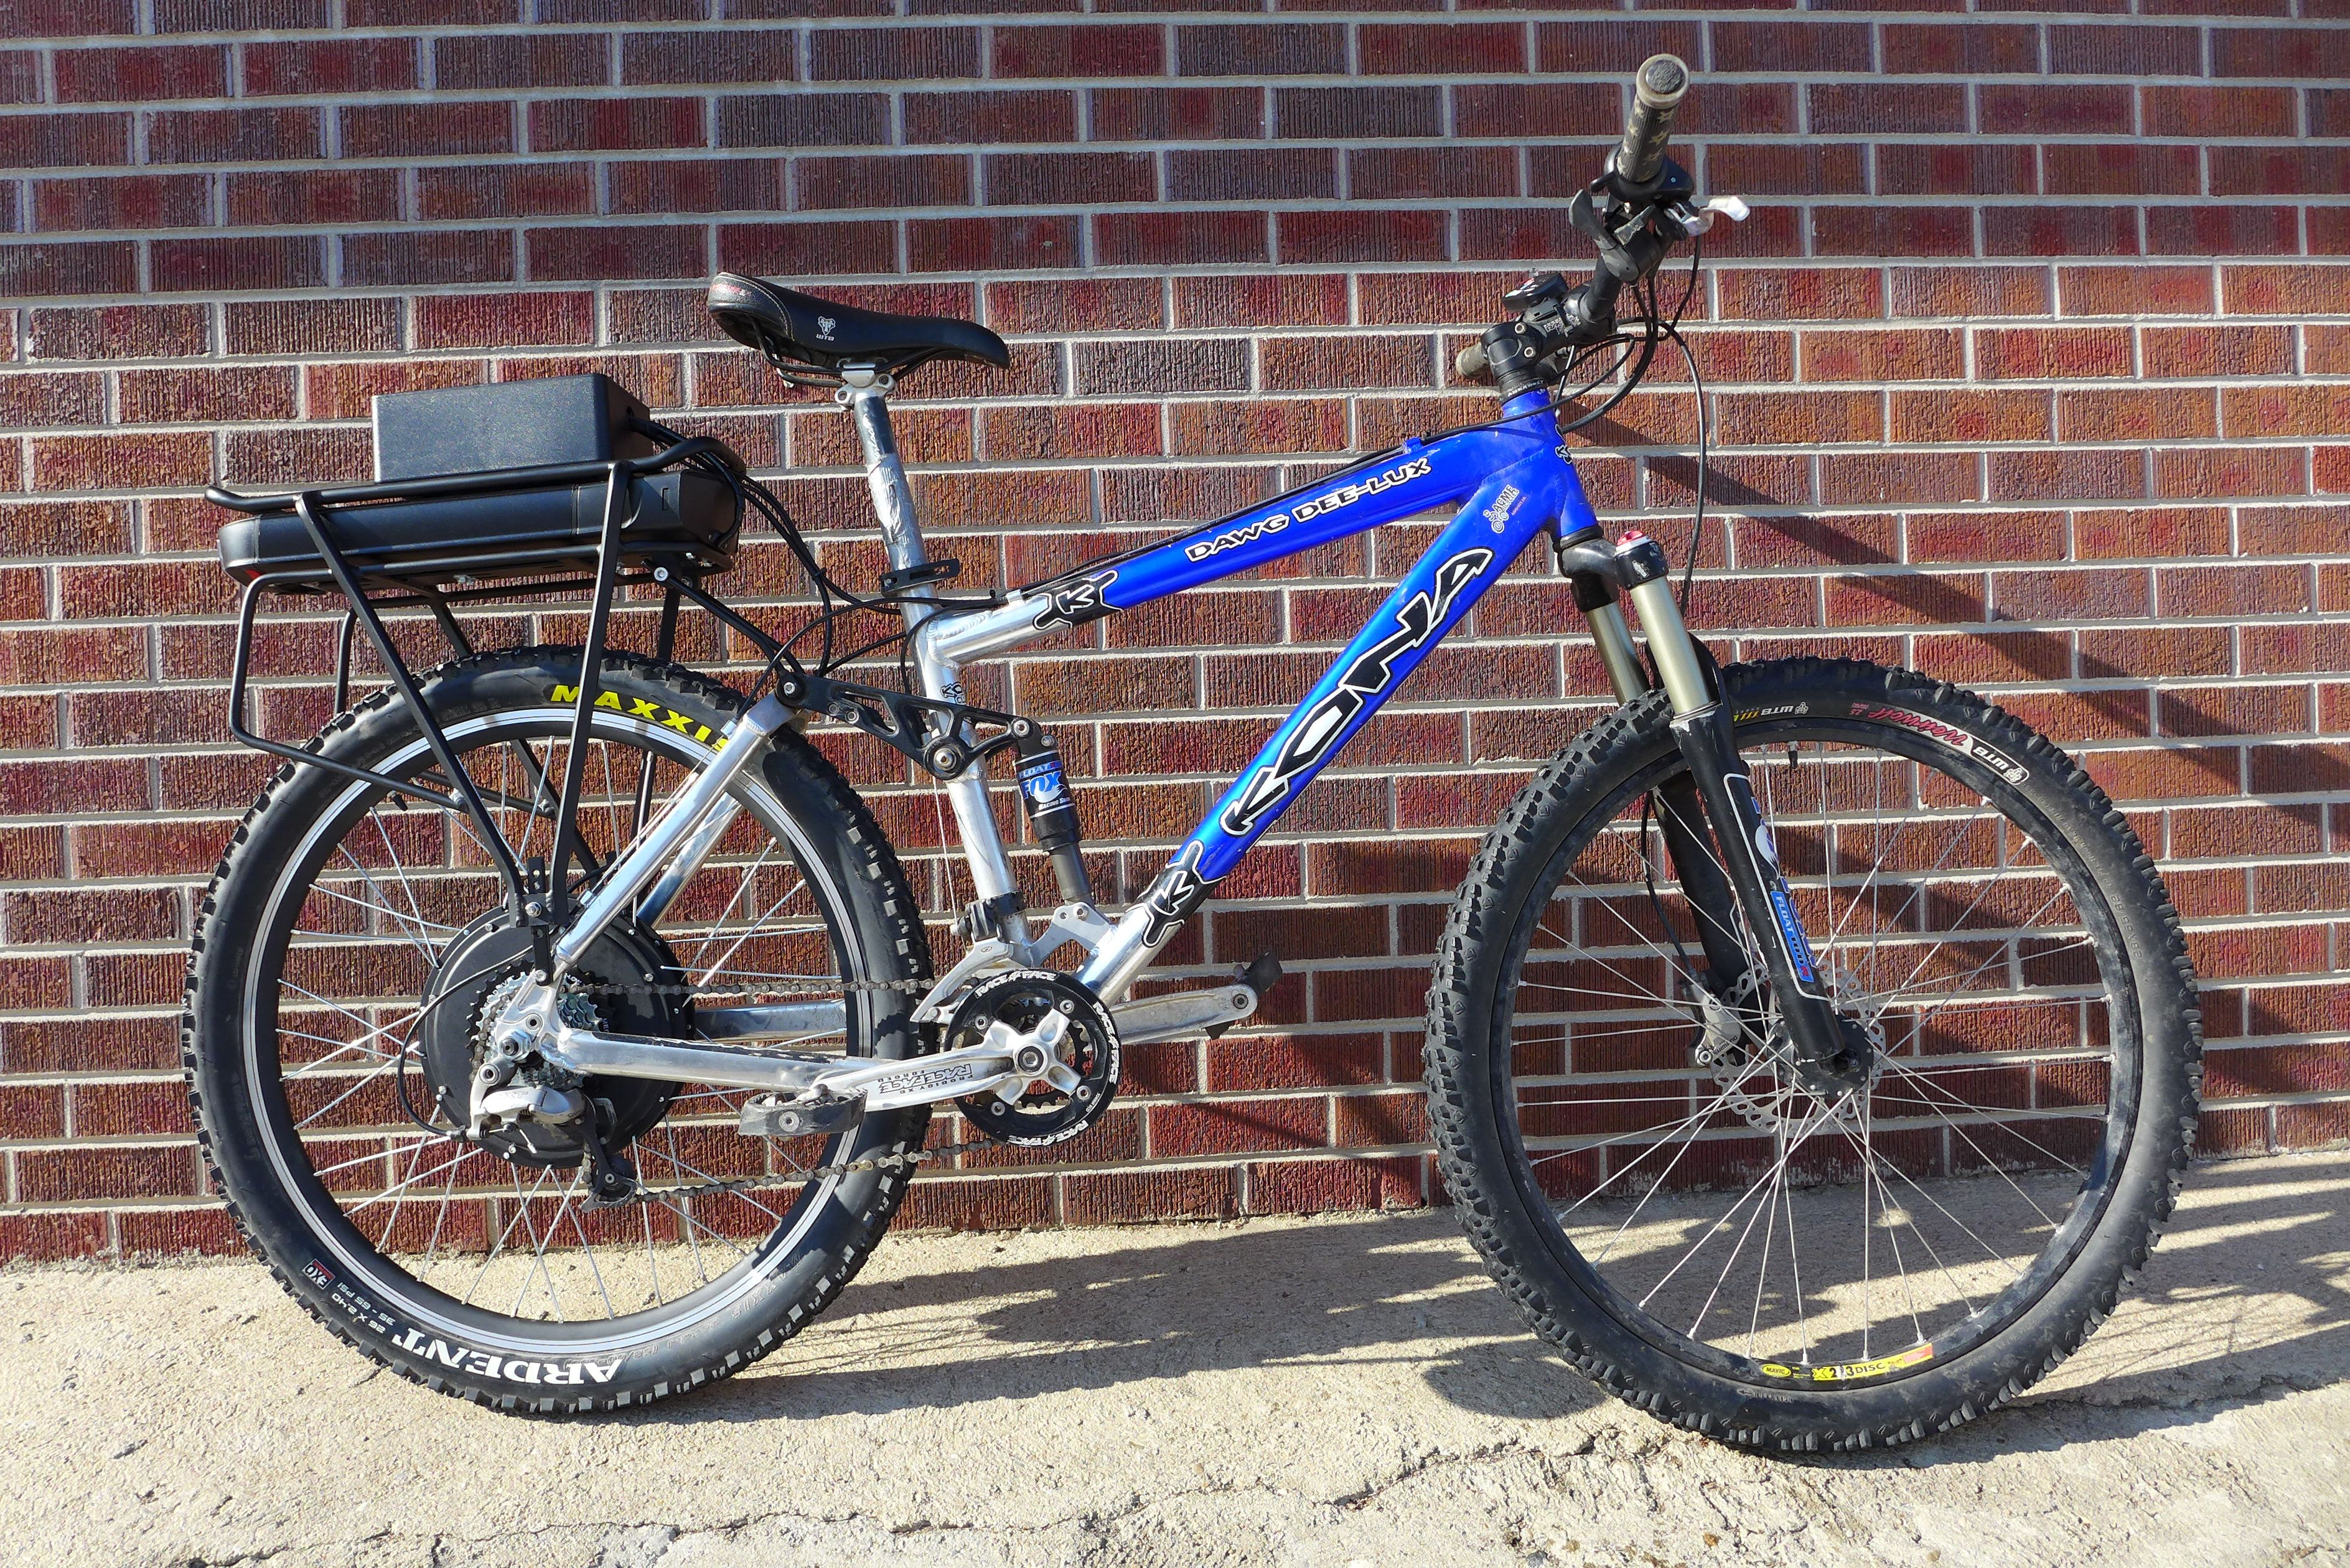 Ebo Mountaineer Electric Bike Kit Installed On A Full Suspension Kona Mountain Bike Electric Bike Kits Monster Bike Electric Bike